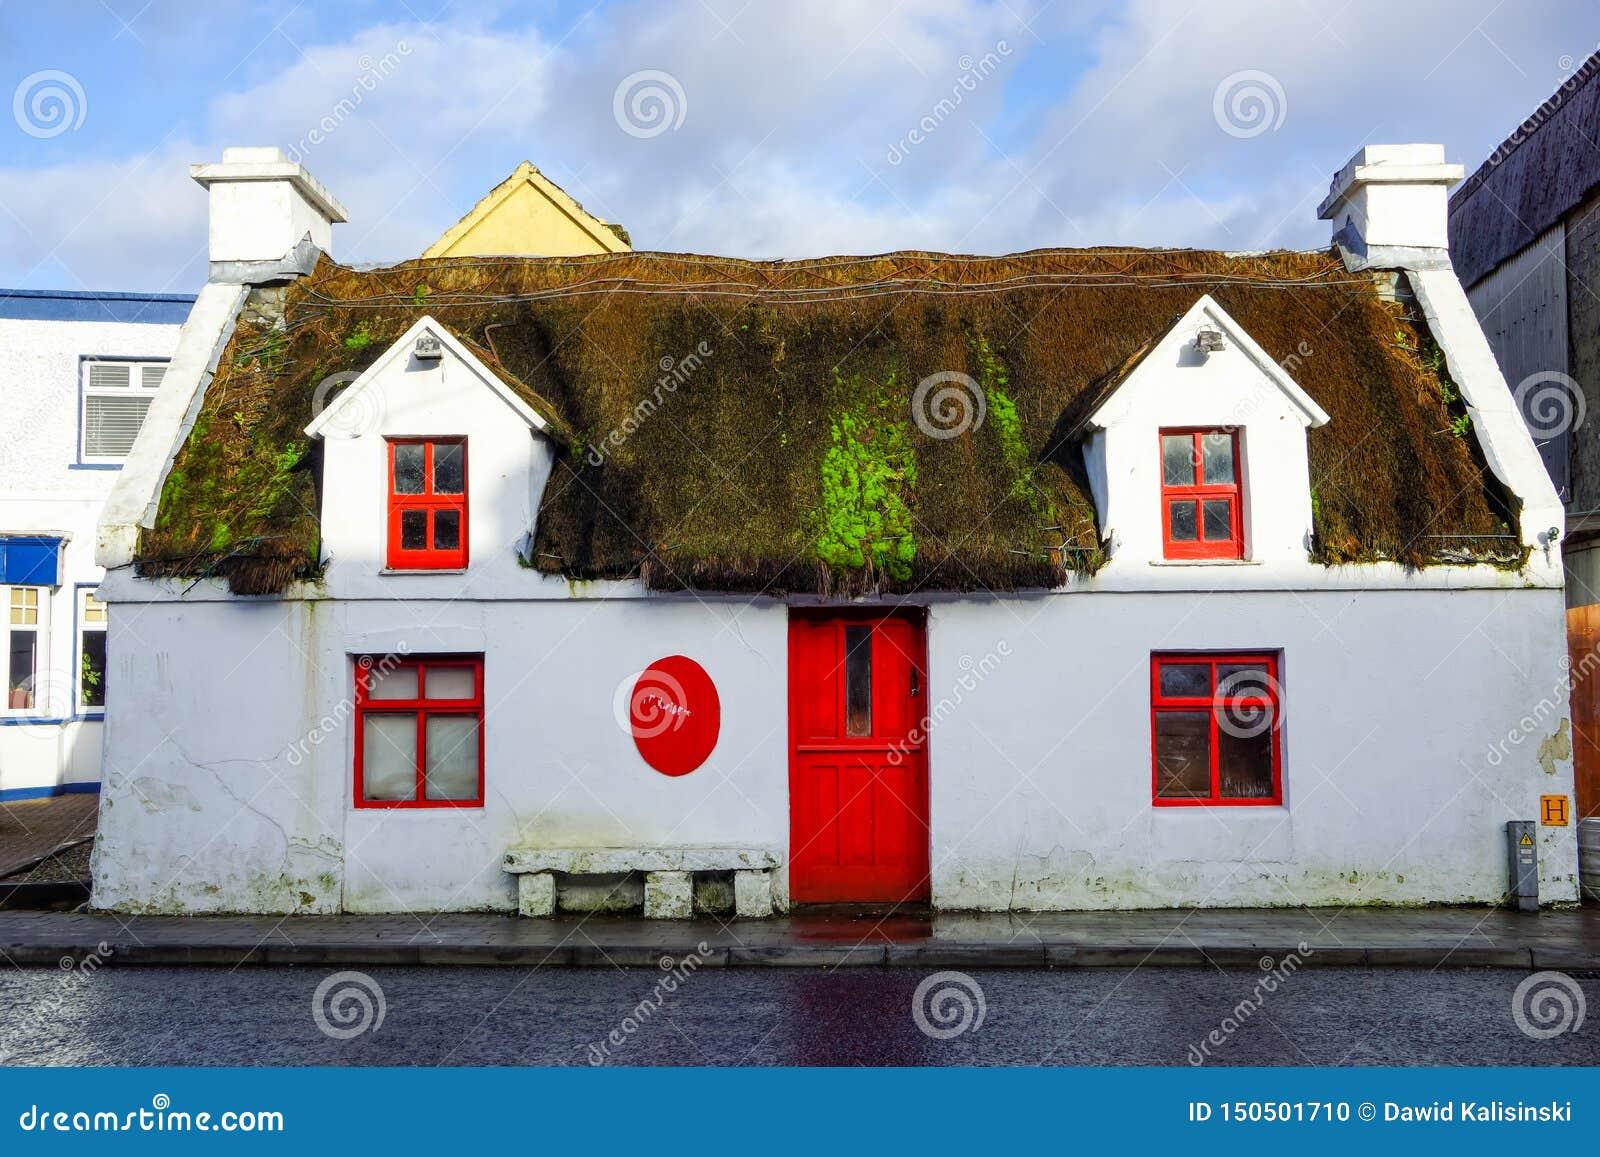 Oud geruïneerd en verlaten met stro bedekt huis met rode vensters en deur